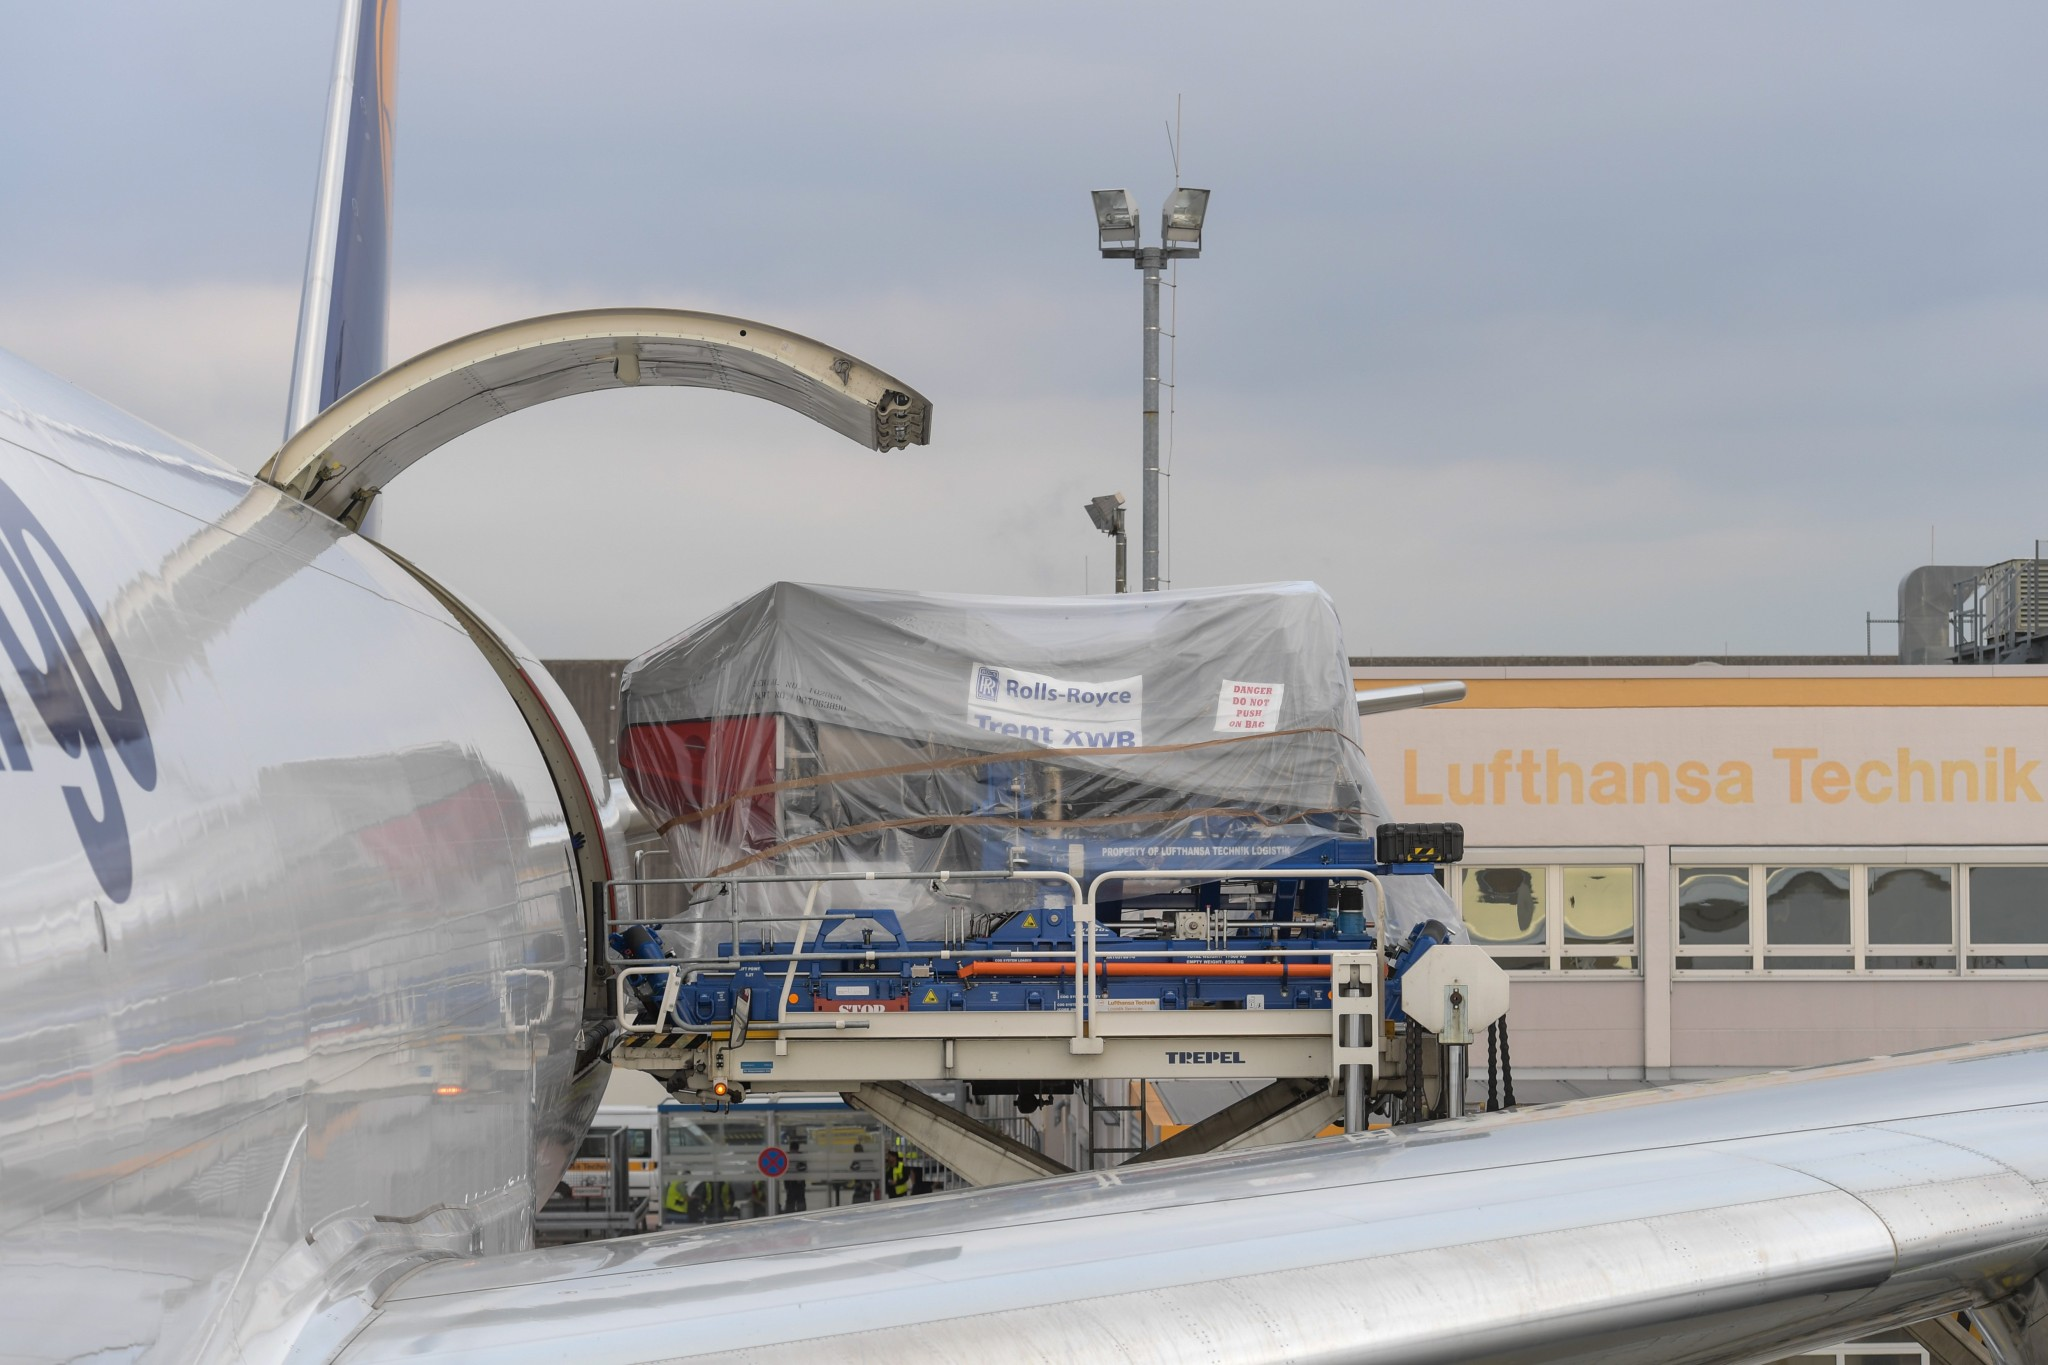 Lufthansa ! LH ! DLH ! - Page 10 Engine_test_Copyright_Lufthansa_Technik_AG-3rd-Oct